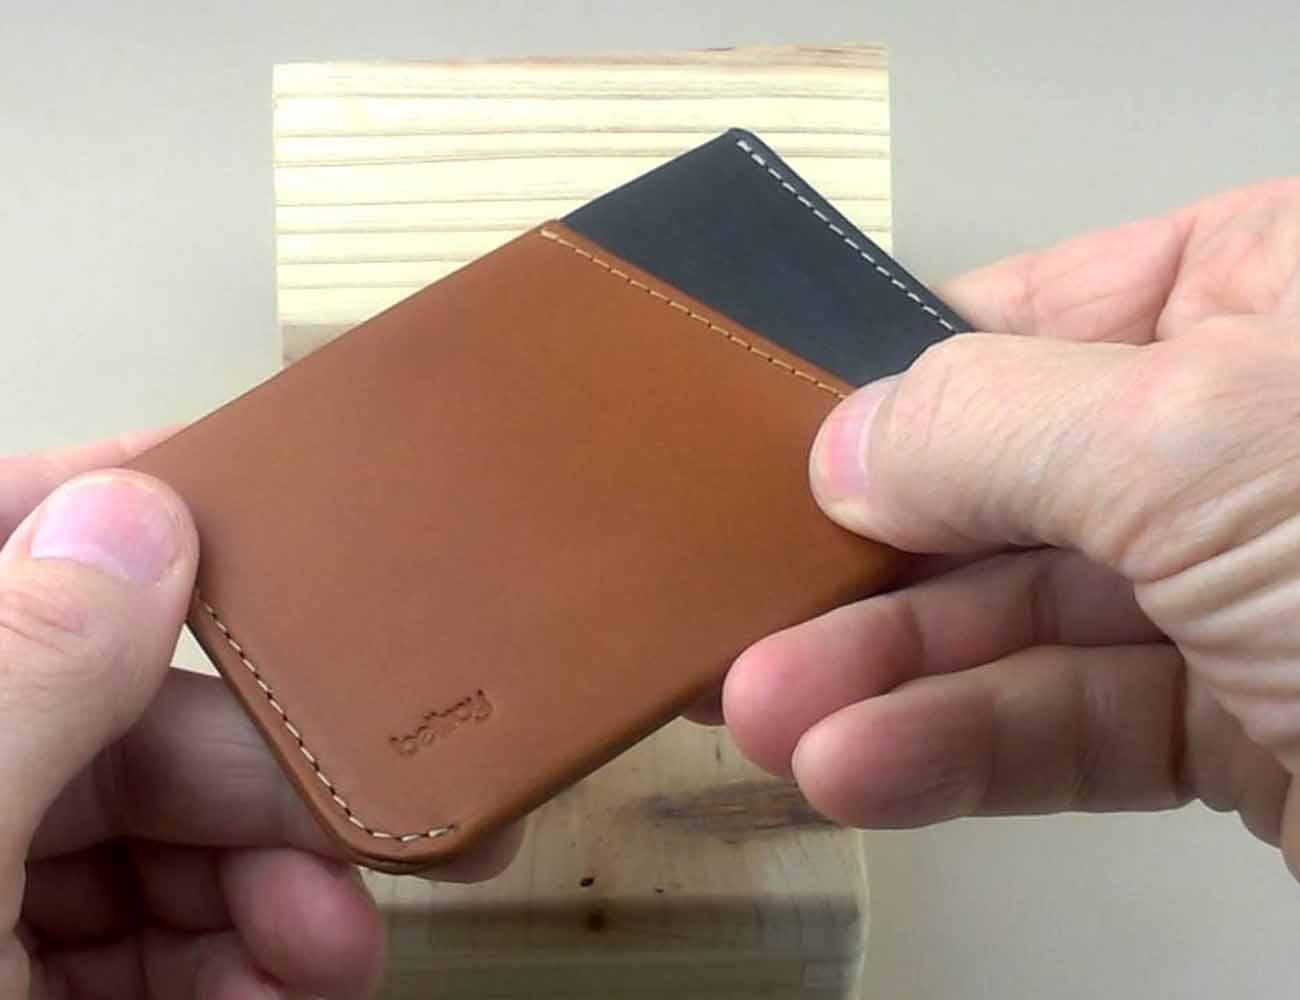 Bellroy Micro Sleeve Minimalist Wallet